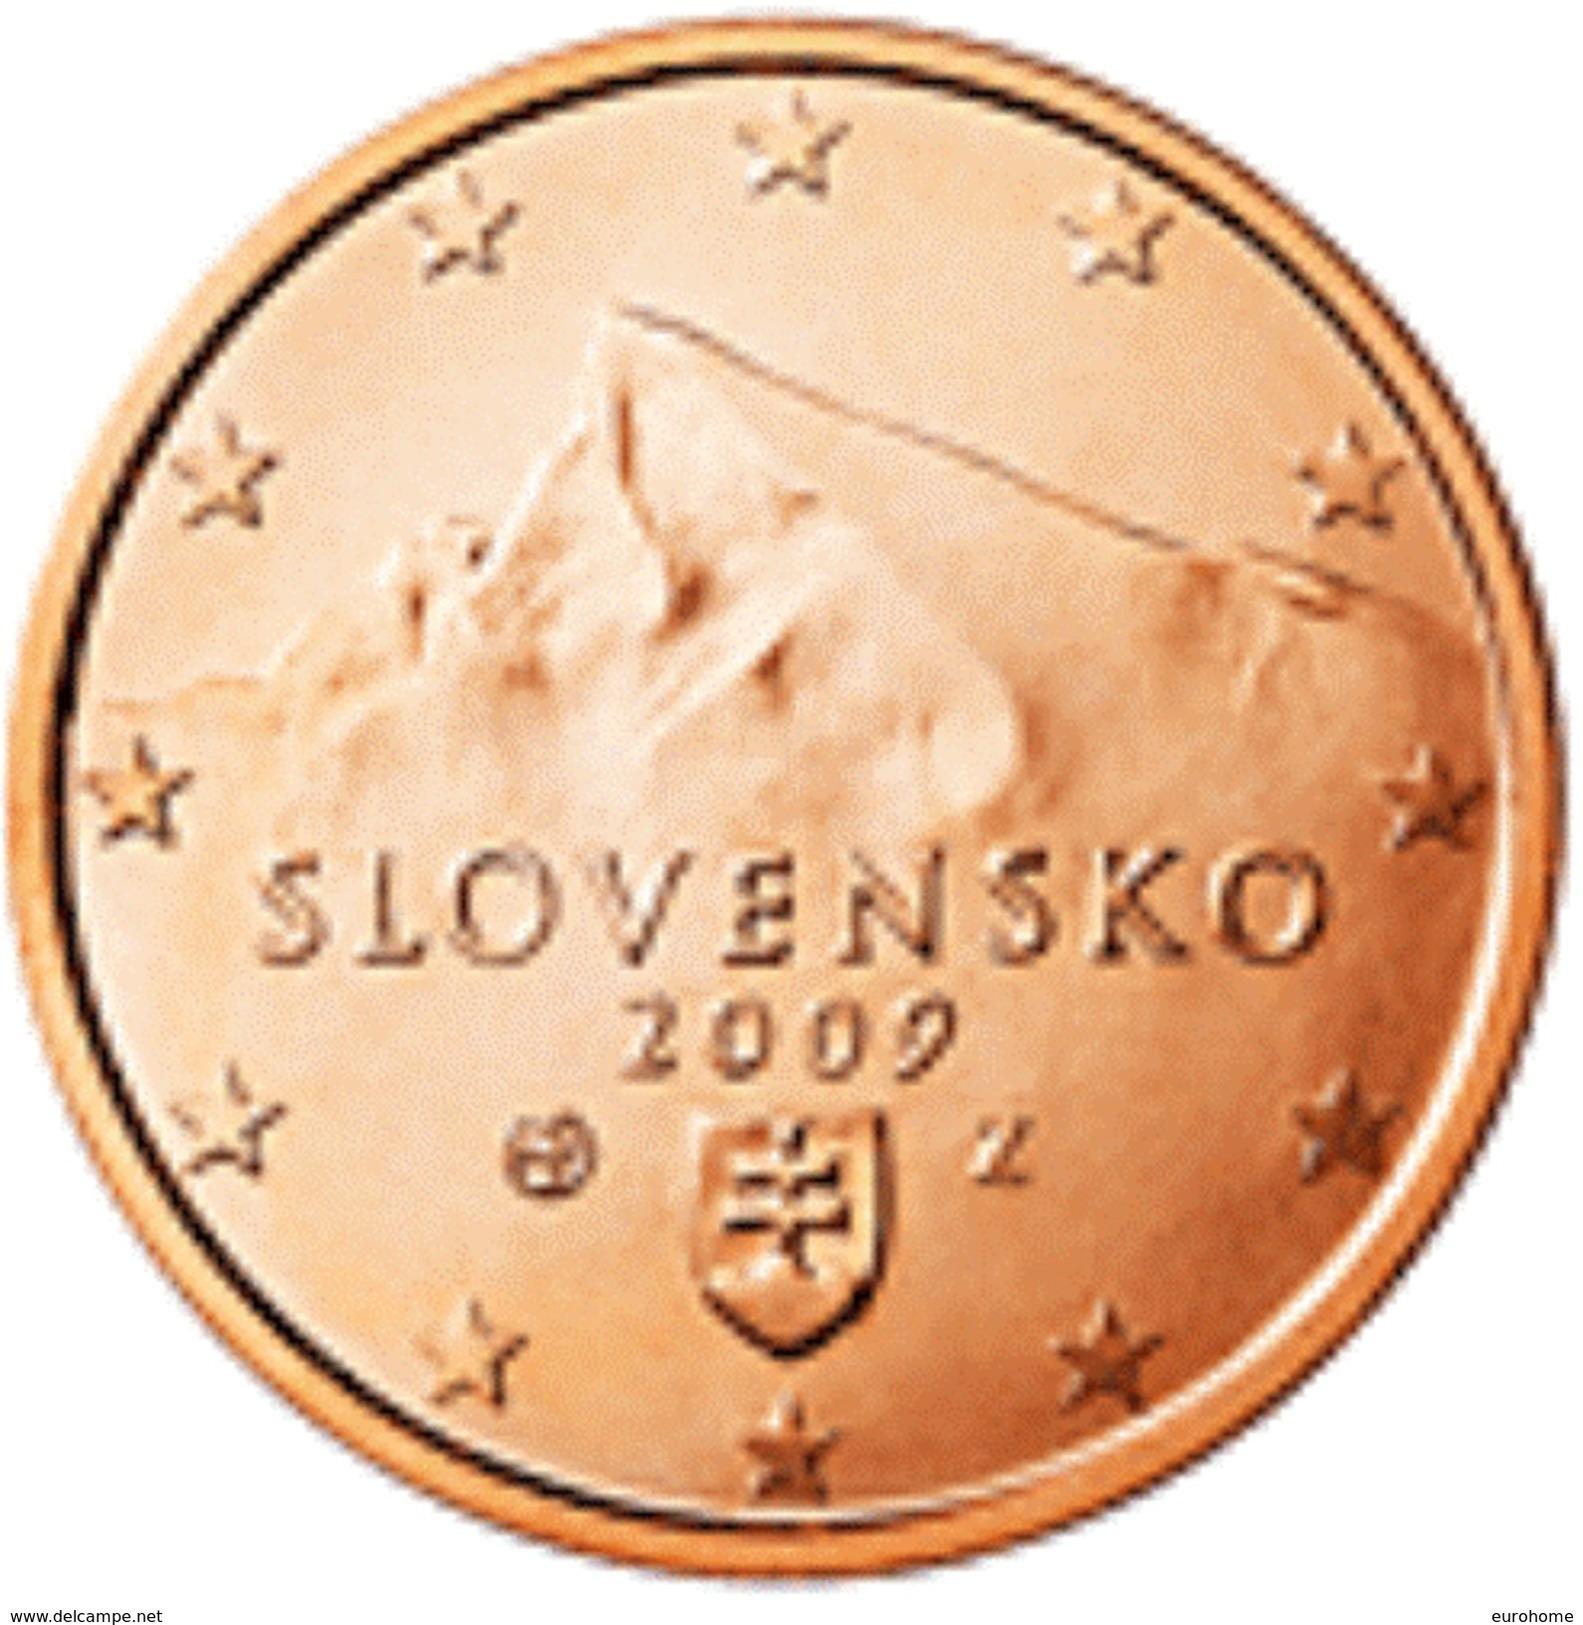 Slovakije 2017     1 Cent      UNC Uit Zakjes  UNC Du Sackets  !! - Slowakei